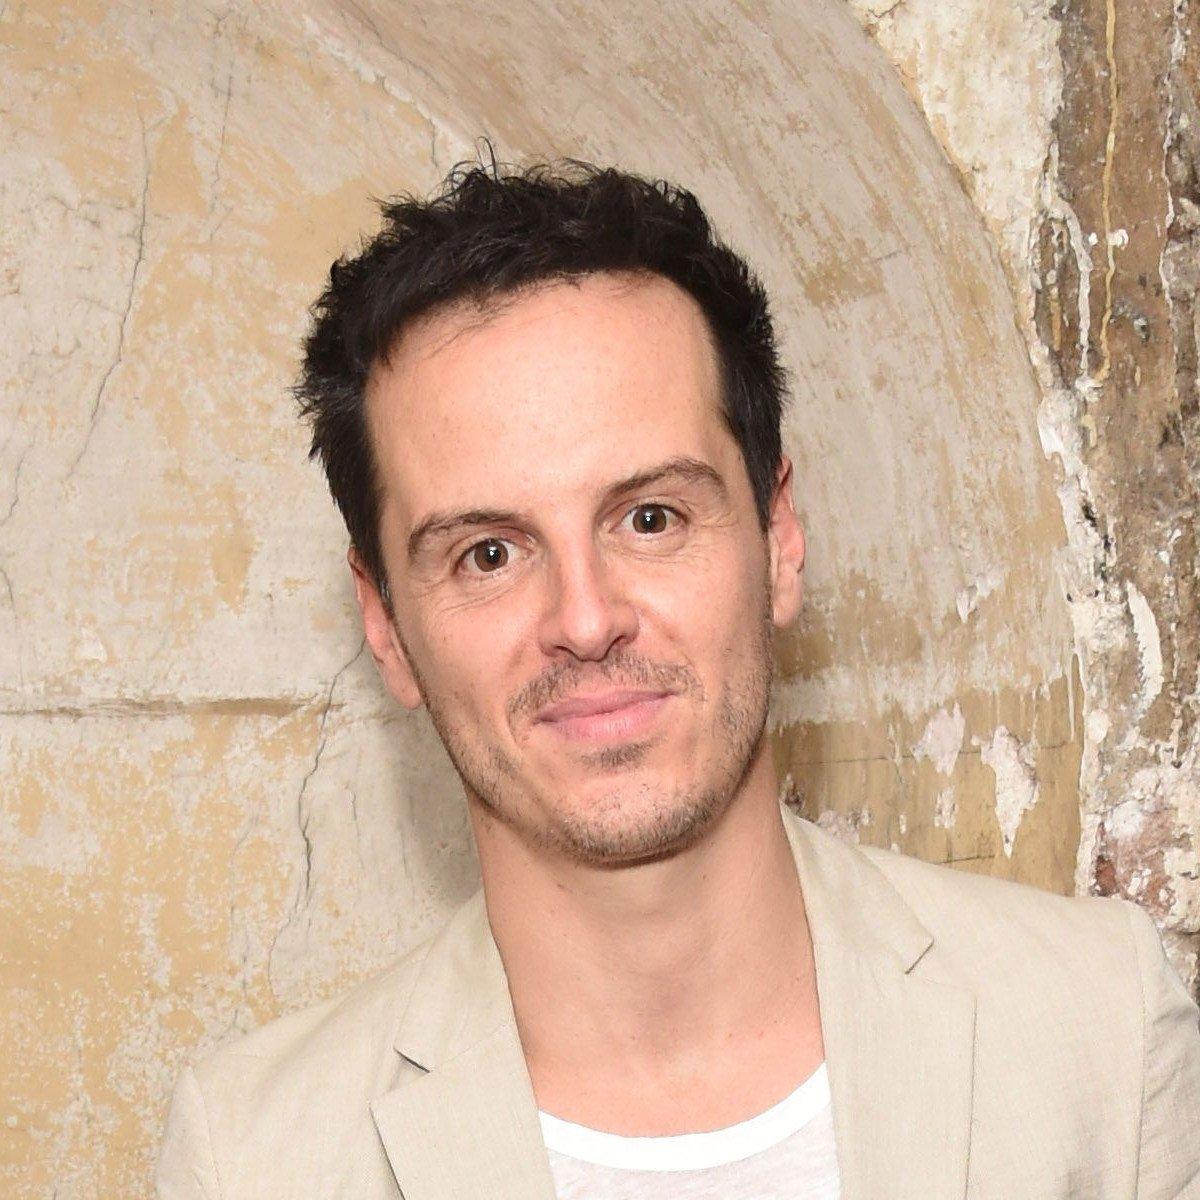 #Sherlock's Andrew Scott Joins HBO's His Dark Materials. #AndrewScott #HBO #HisDarkMaterials - https://t.co/KX92rjwsLh https://t.co/AtkVs9uWex